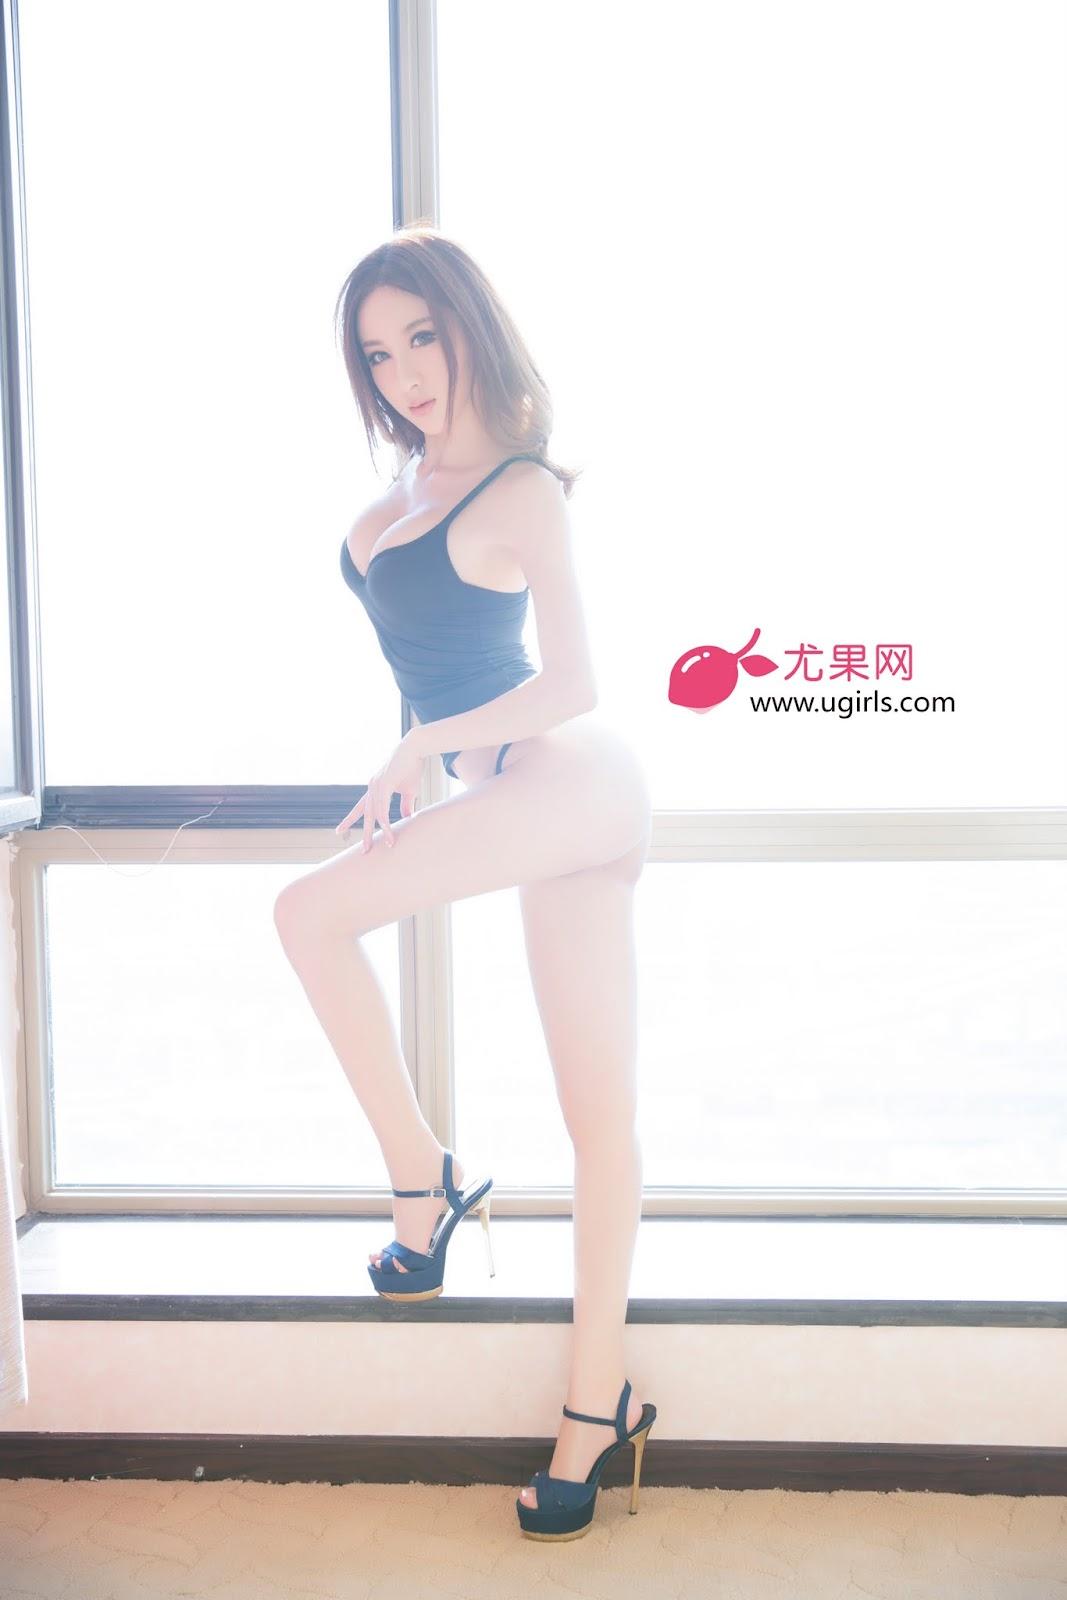 A14A6728 - Hot Photo UGIRLS NO.6 Nude Girl